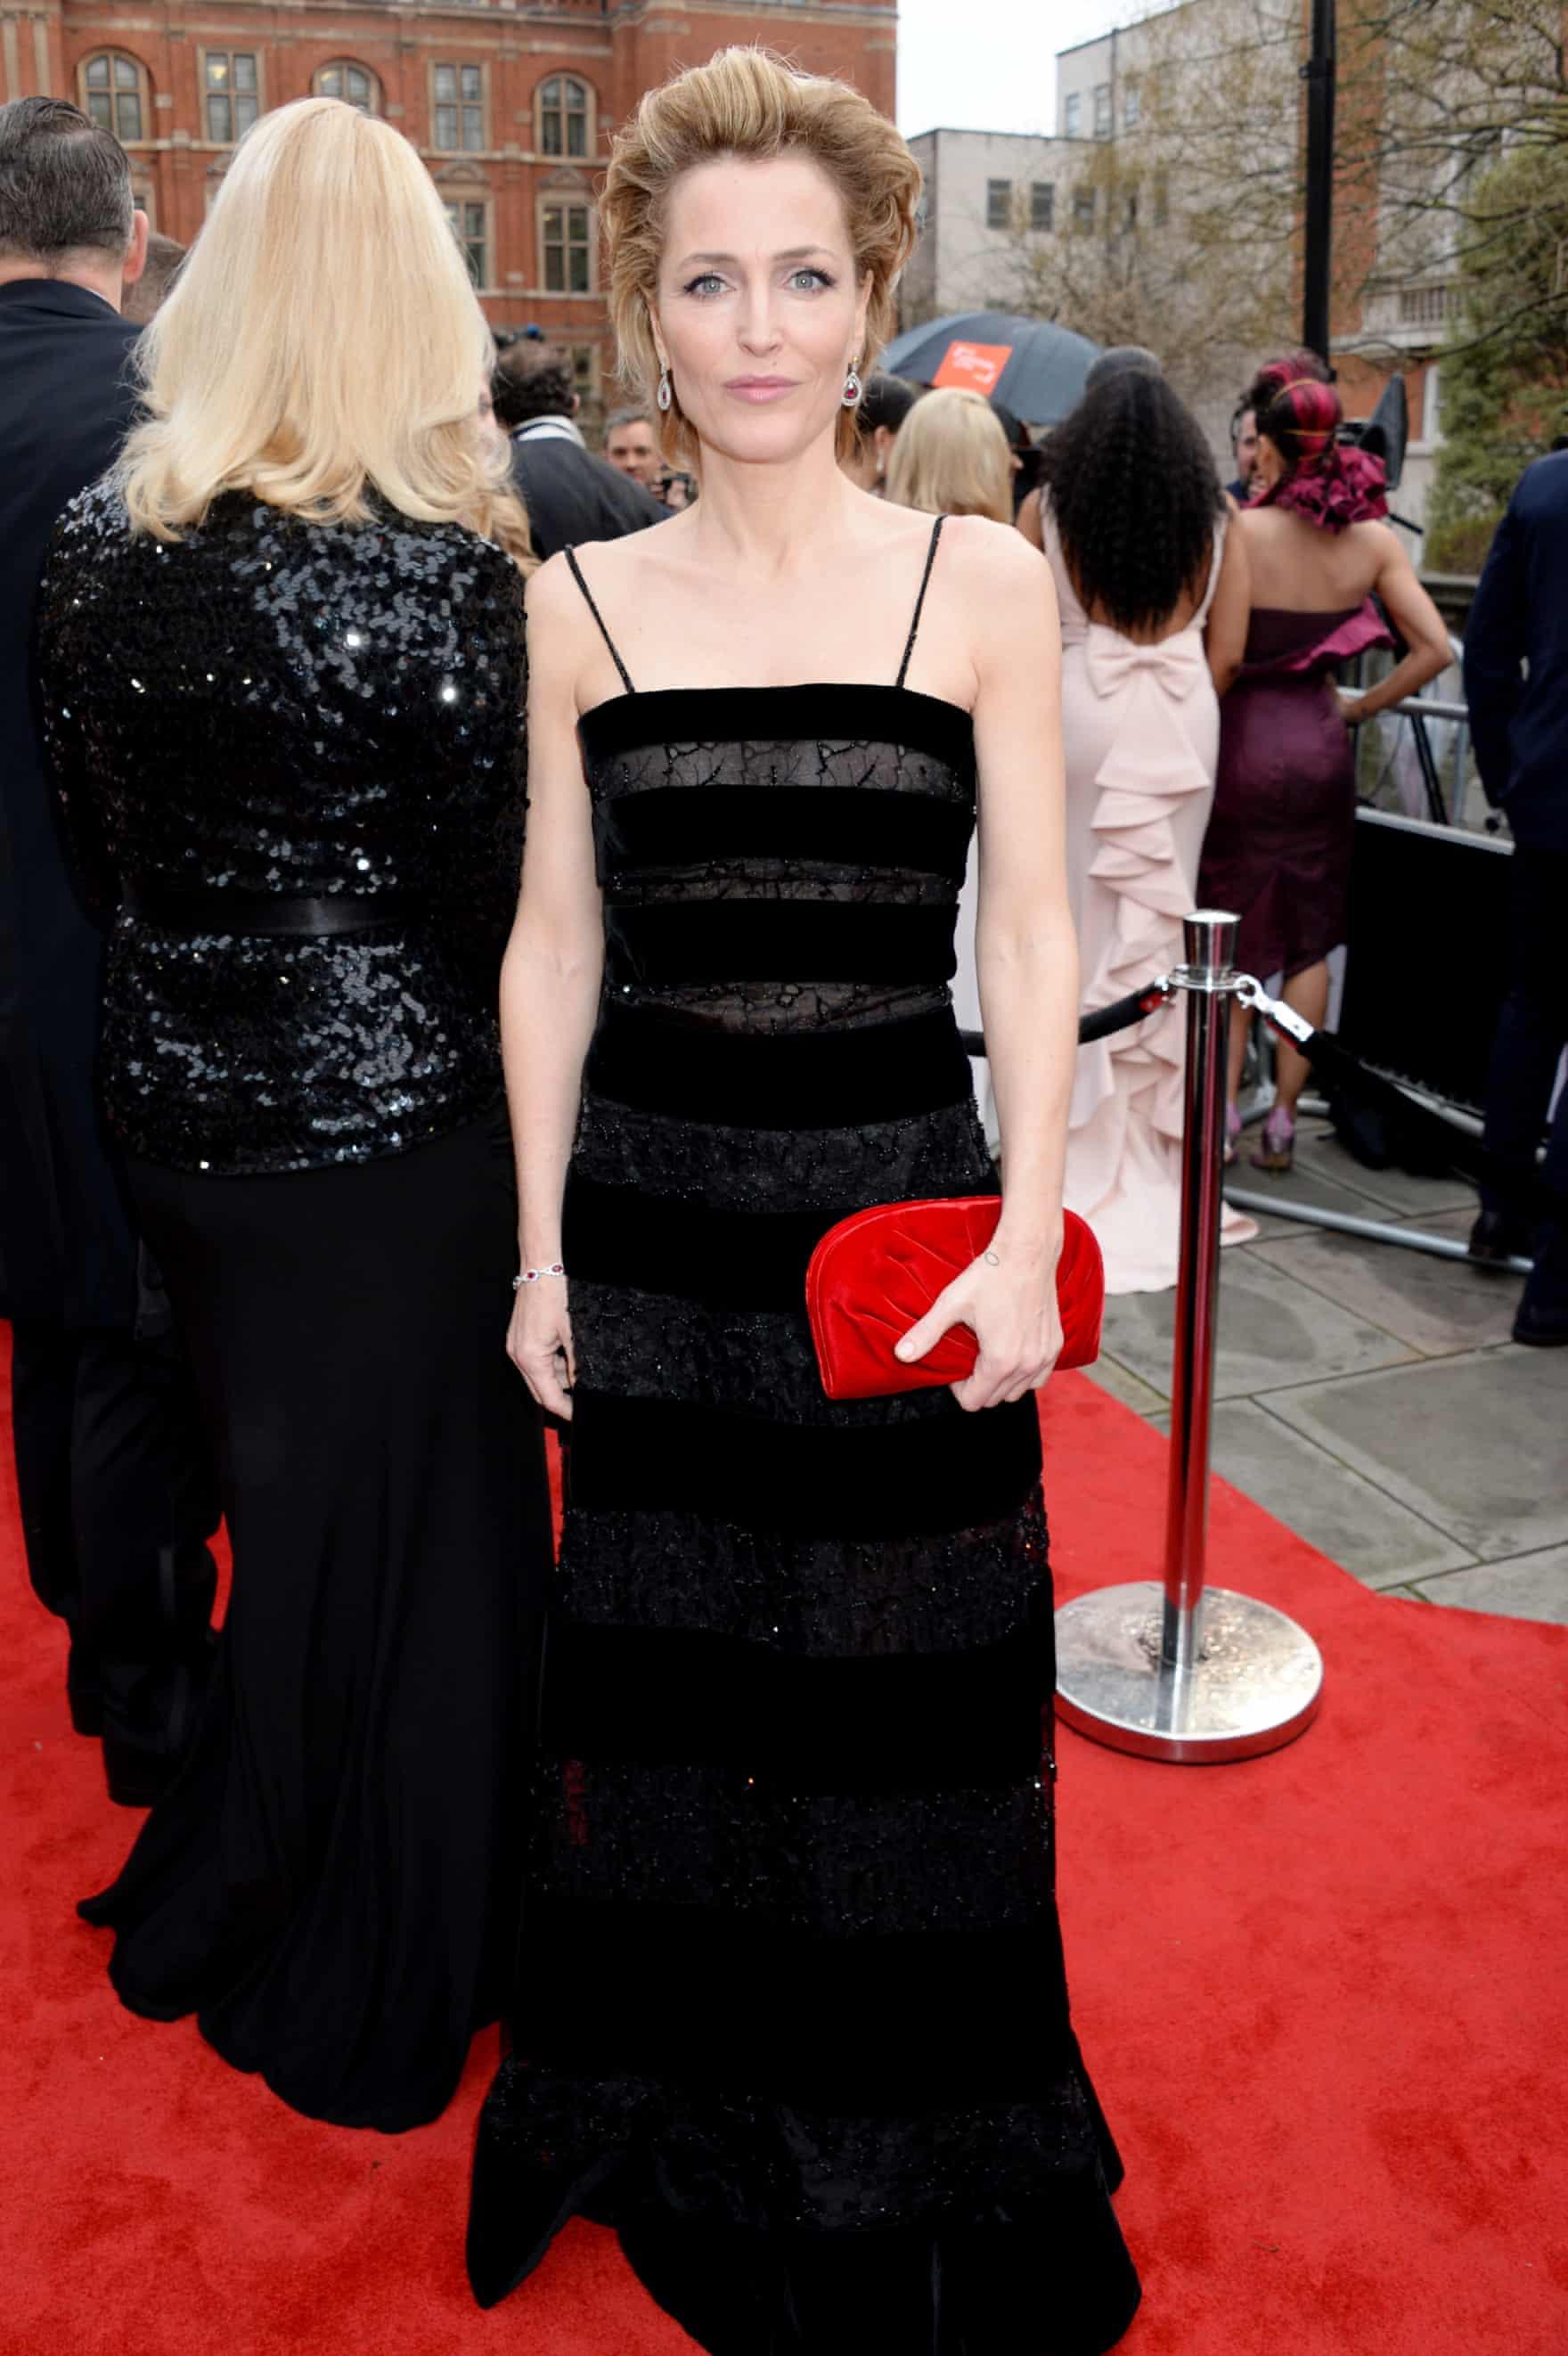 Gillian Anderson  Photograph: Richard Young/Rex/Shutterstock